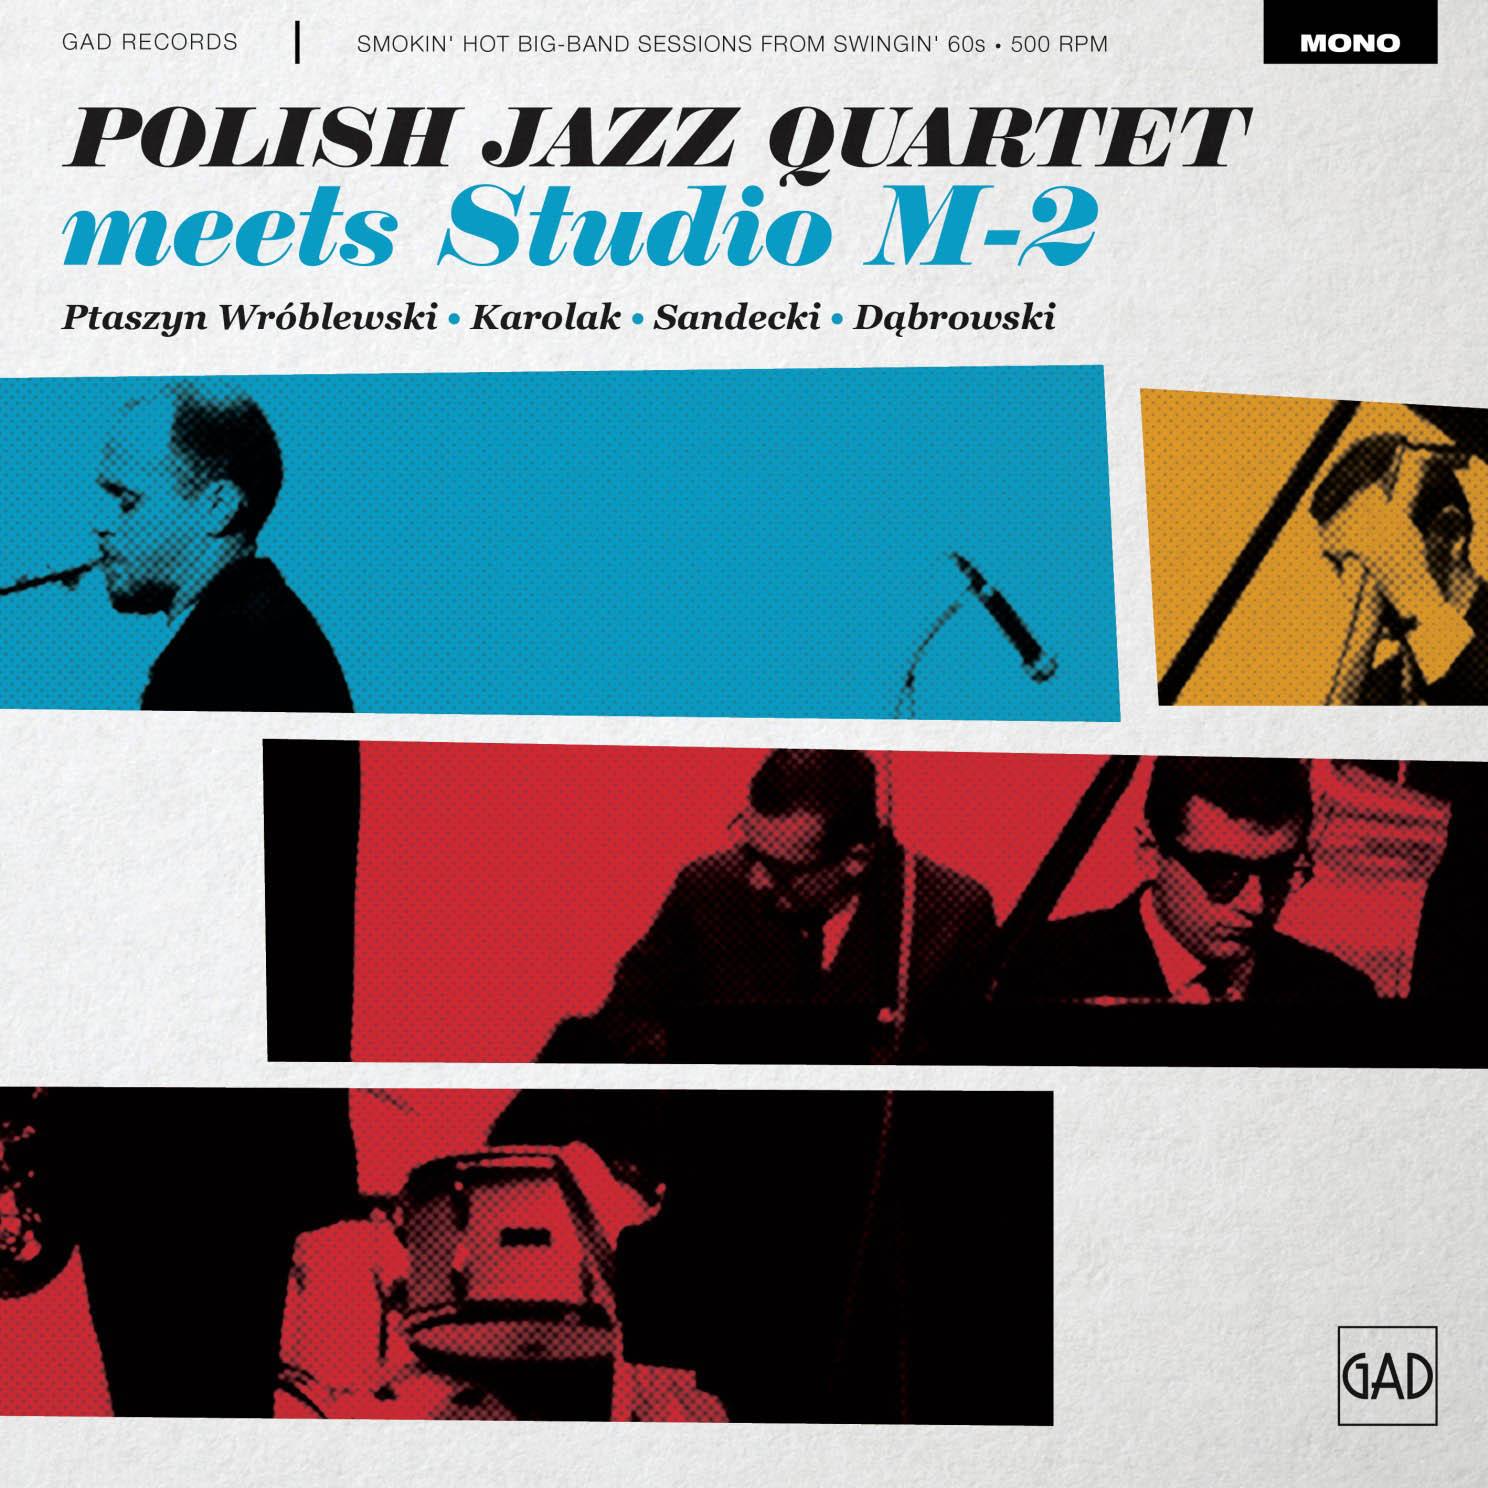 Polish Jazz Quartet - Polish Jazz Quartet Meets Studio M-2